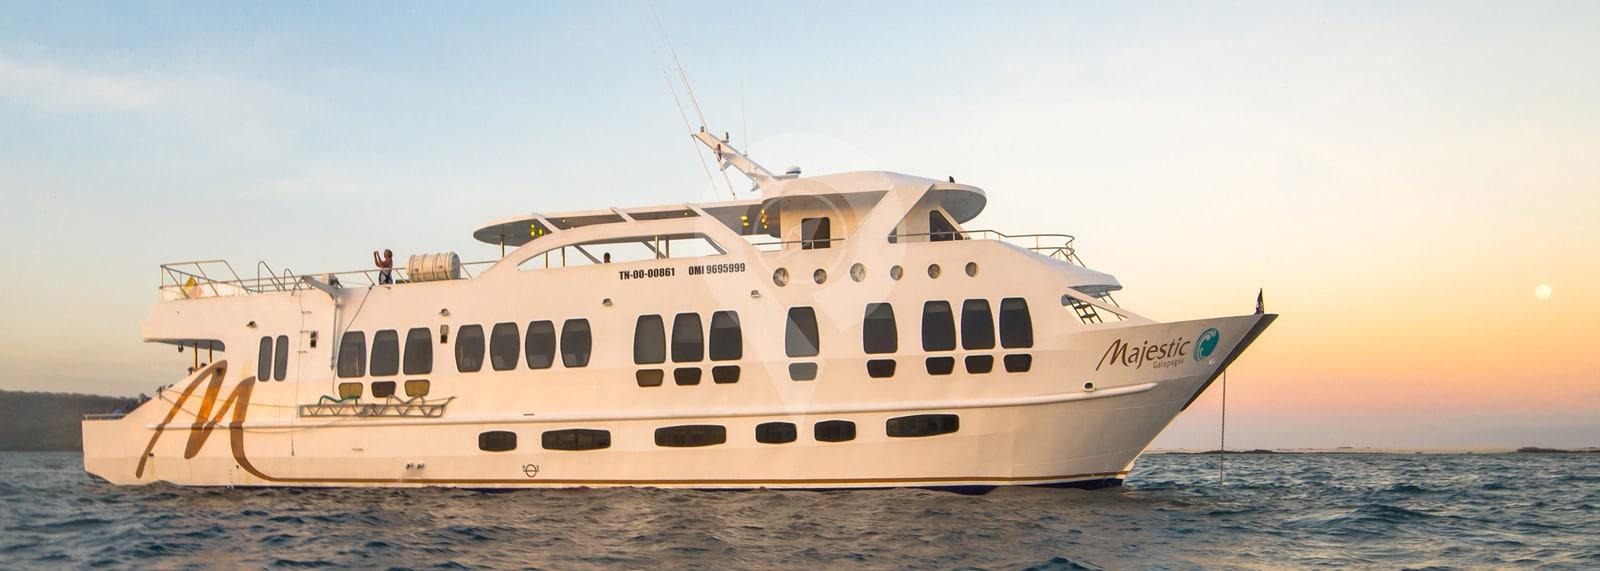 Majestic Galapagos Yacht